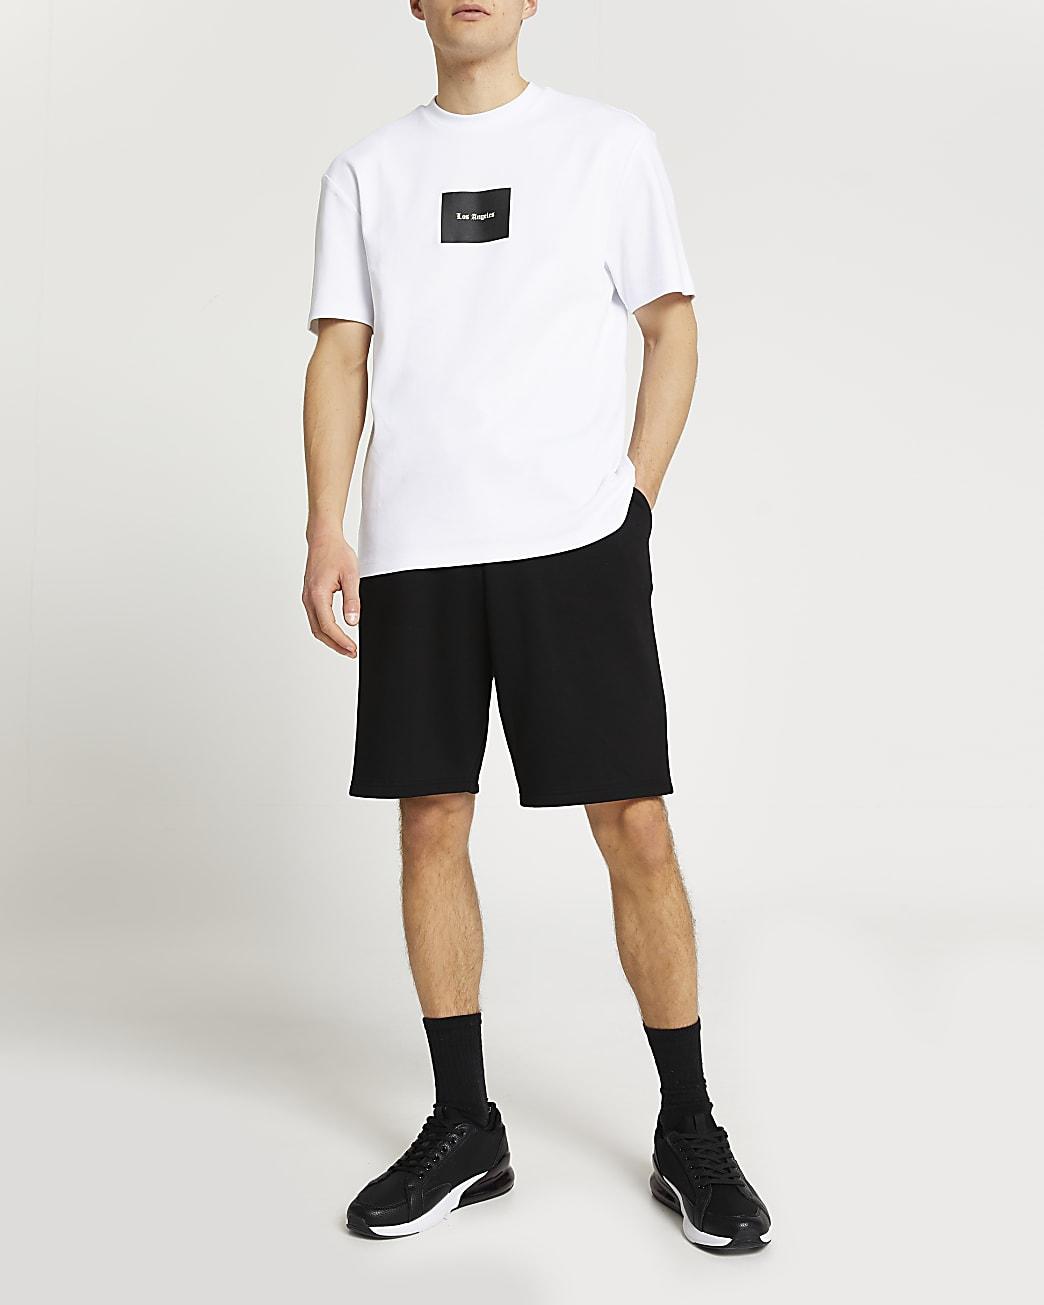 White graphic slim fit t-shirt